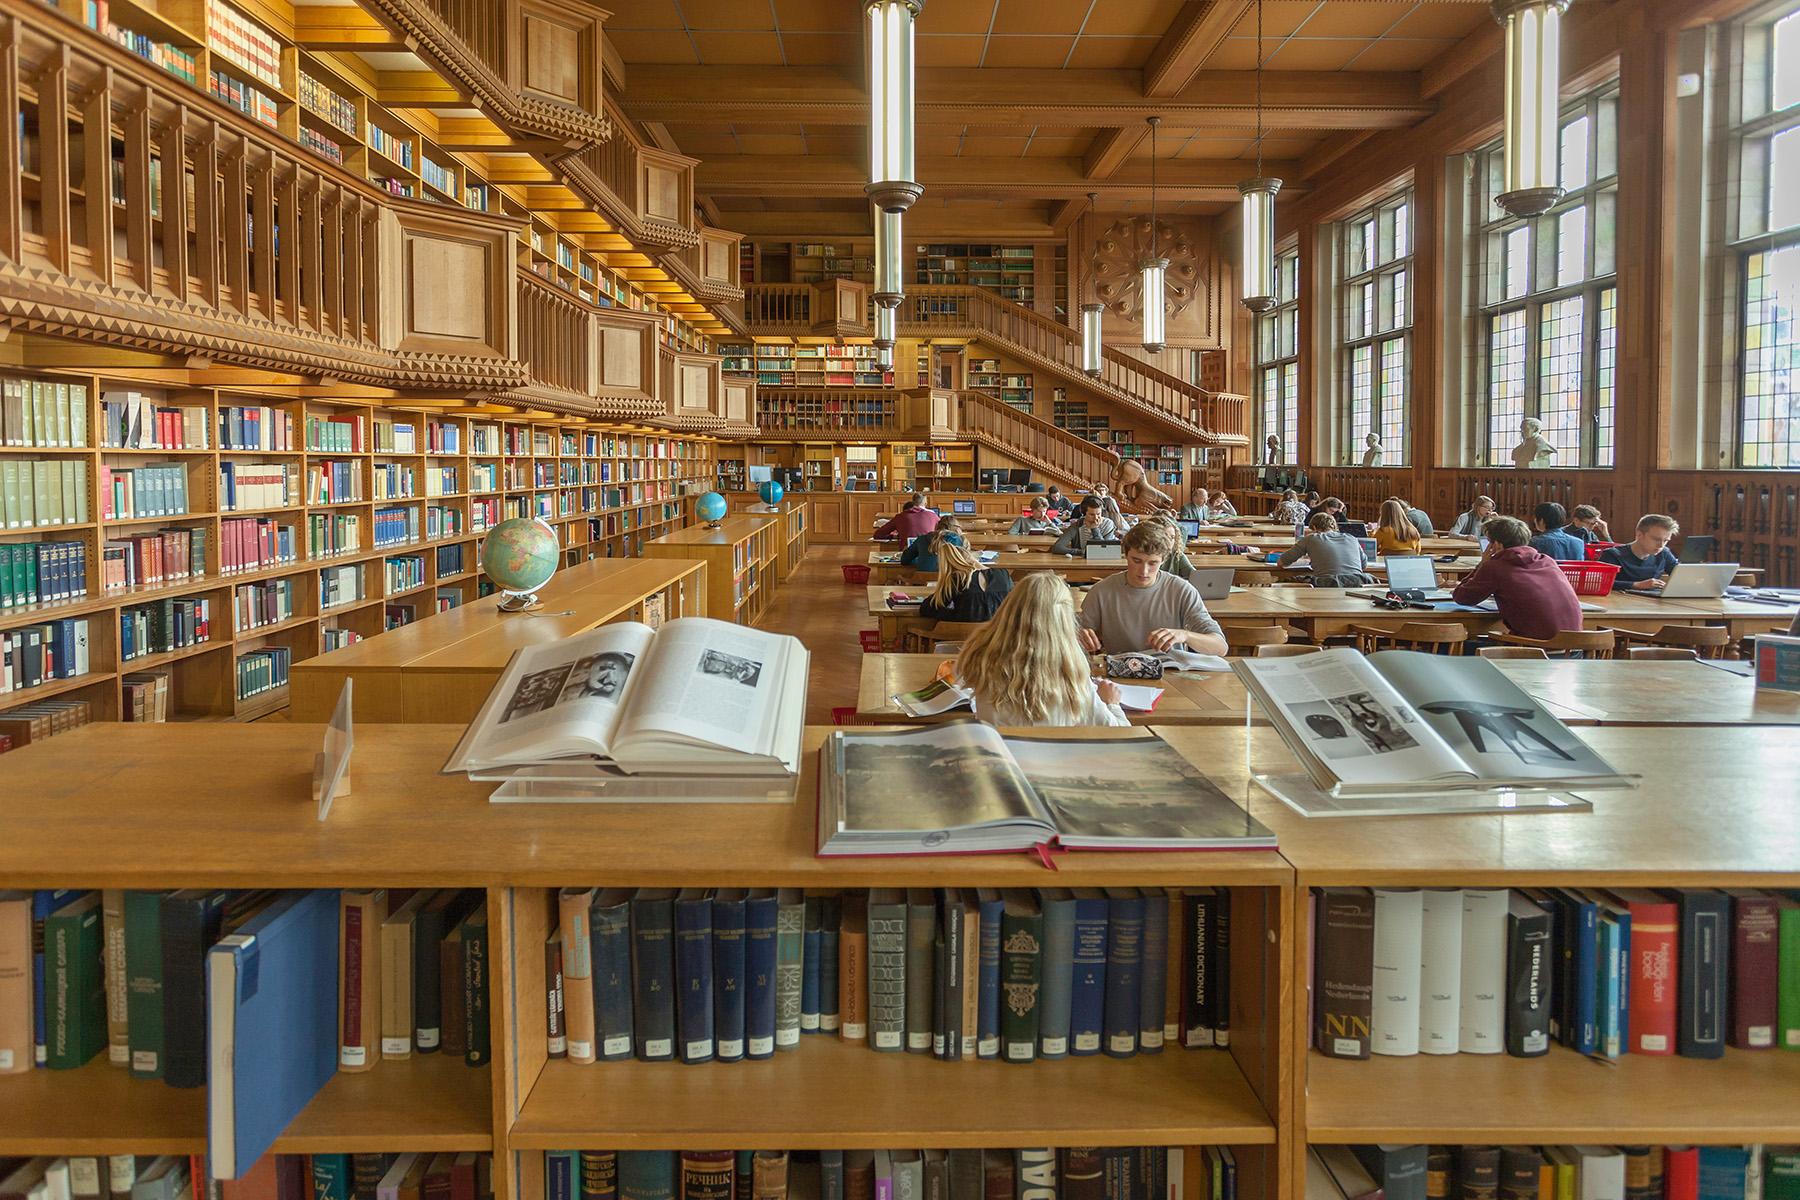 A library at the Katholieke Universiteit Leuven